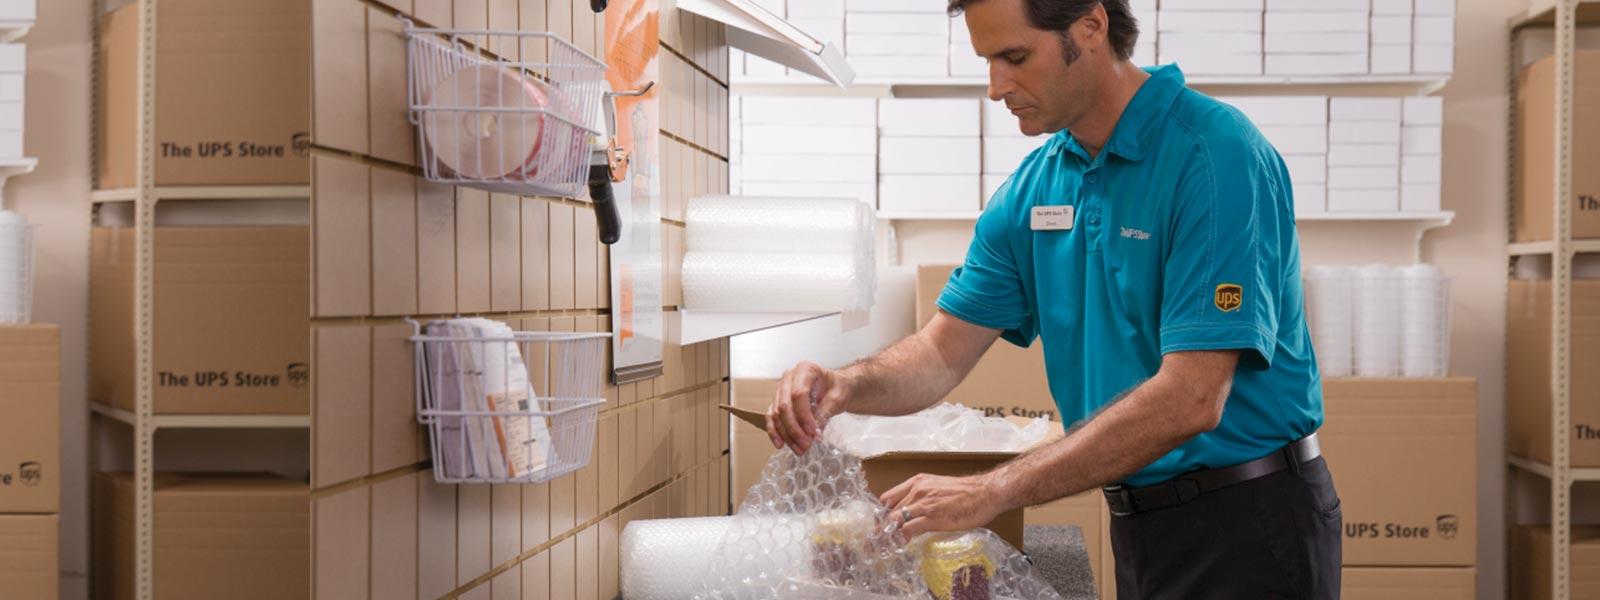 The UPS Store - Tequesta Full-service